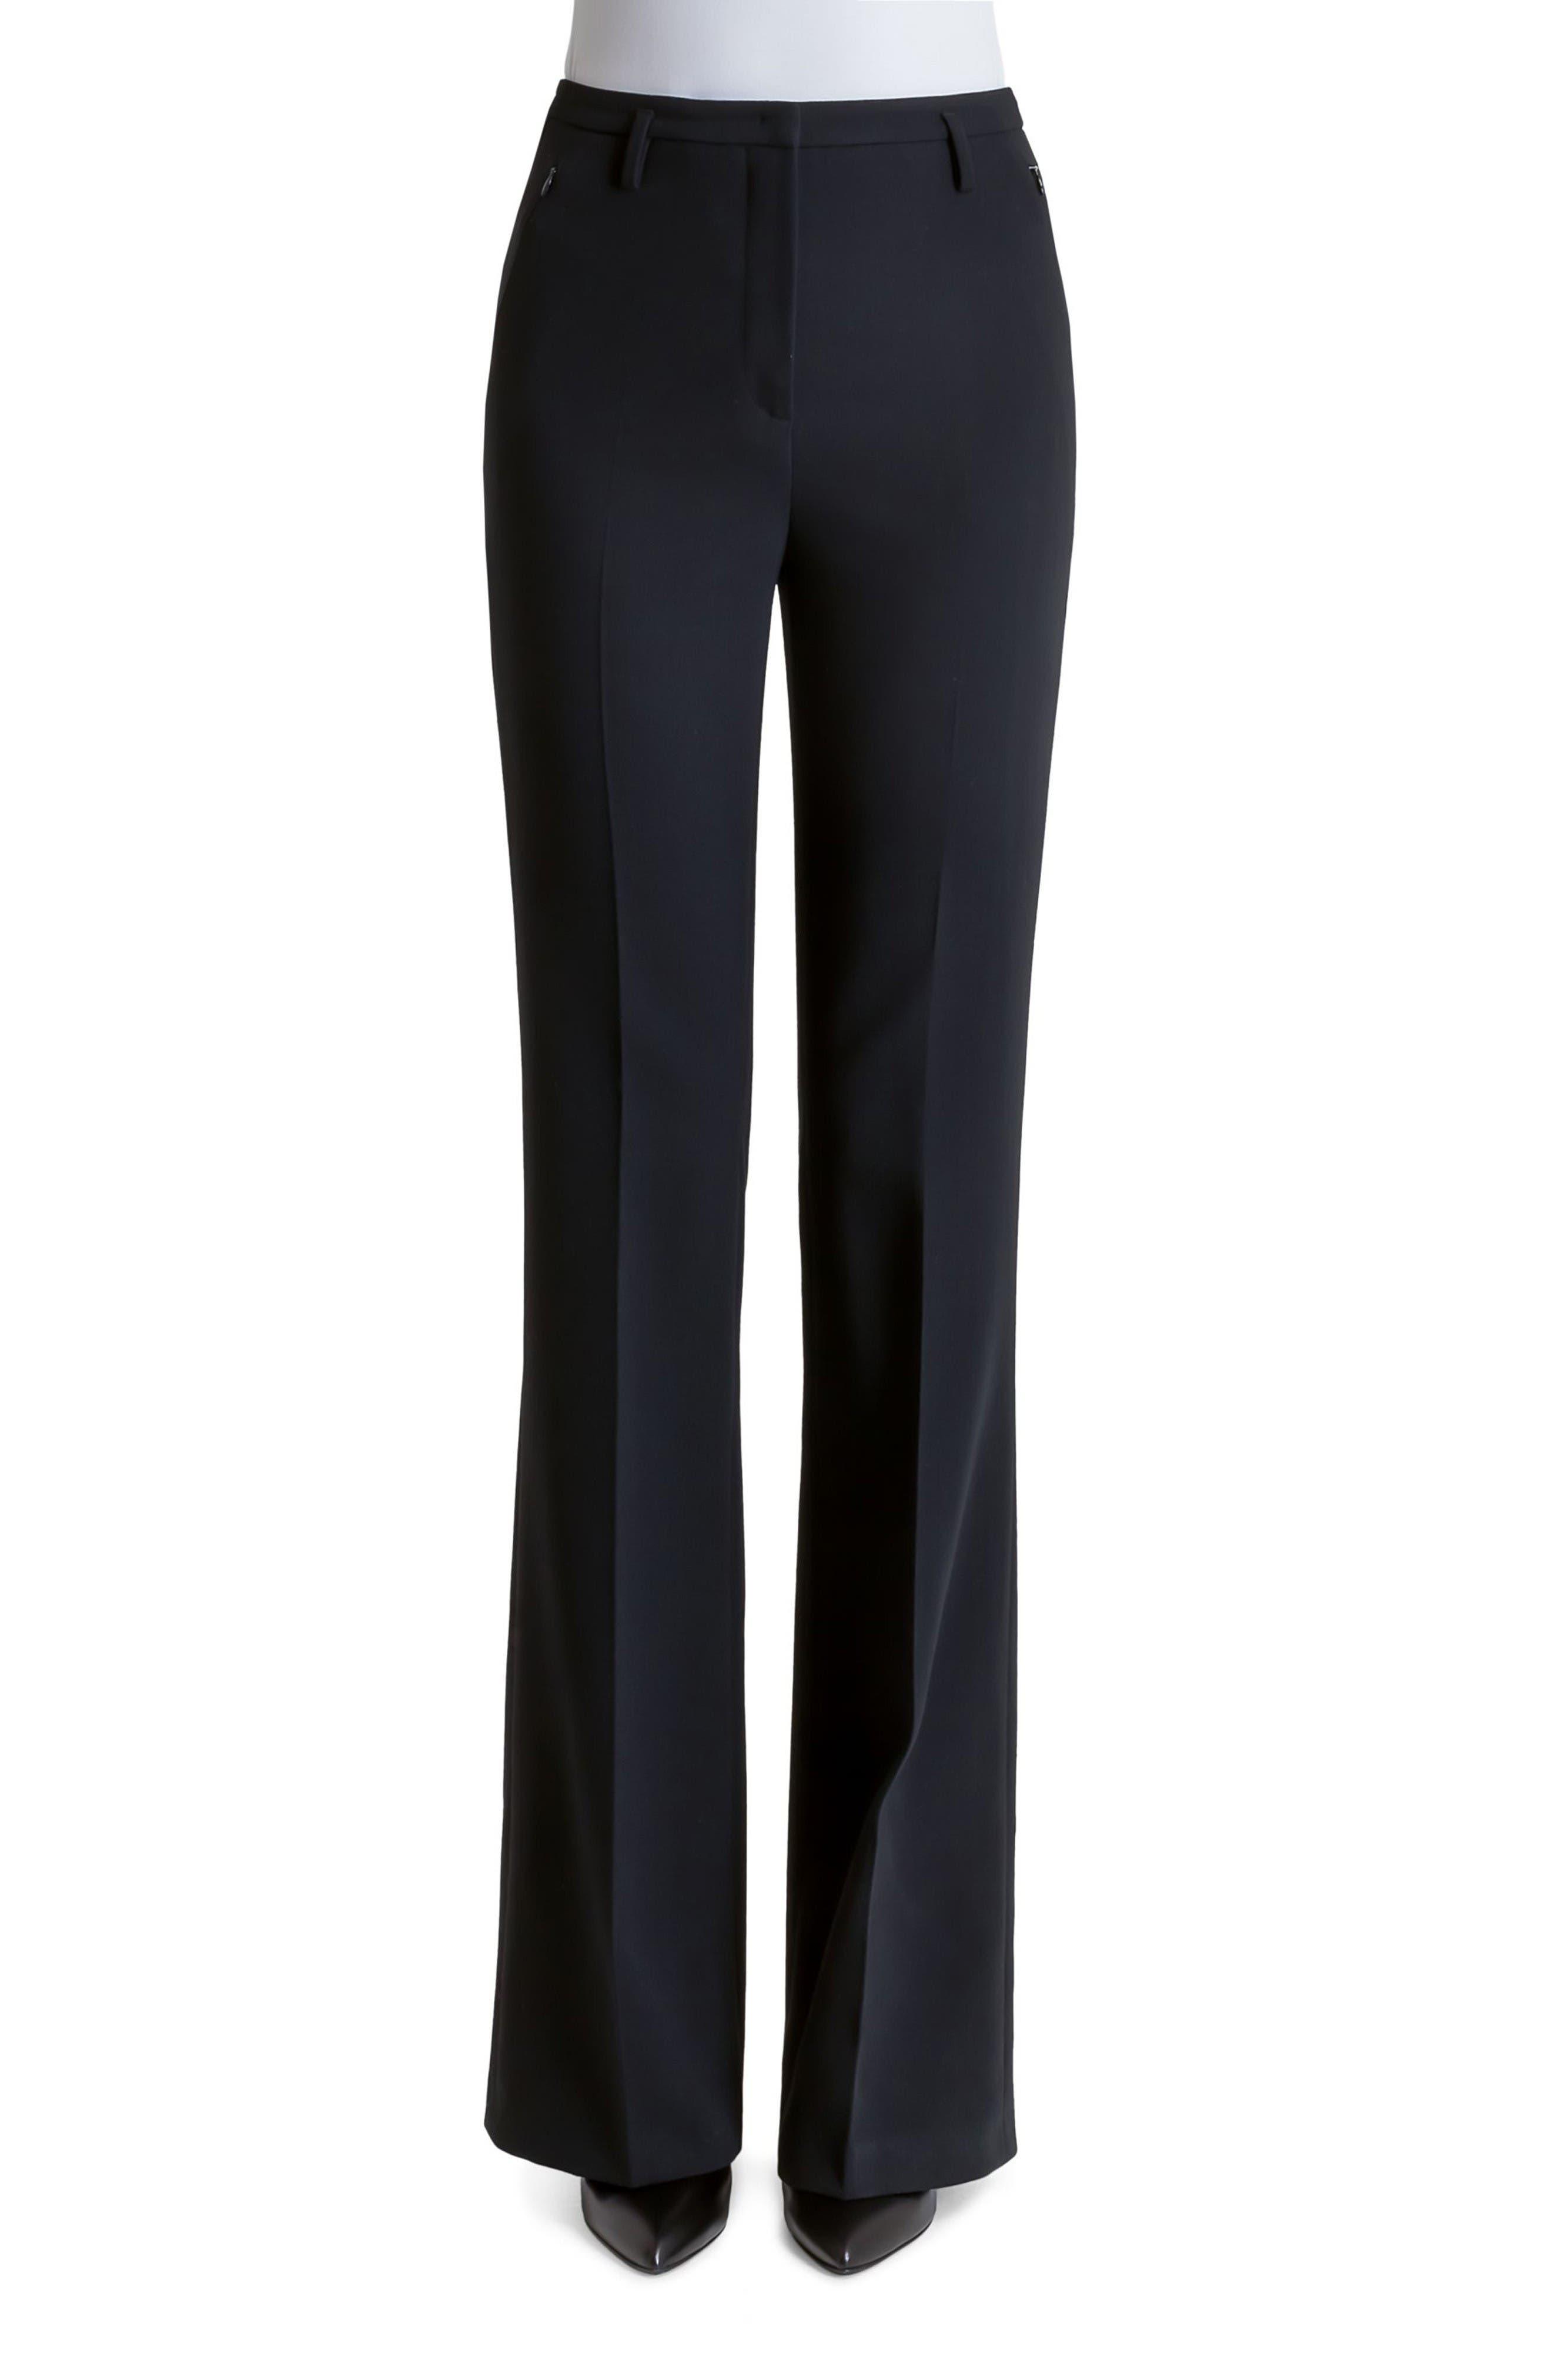 Akris Farrah Stretch Wool Flare Pants